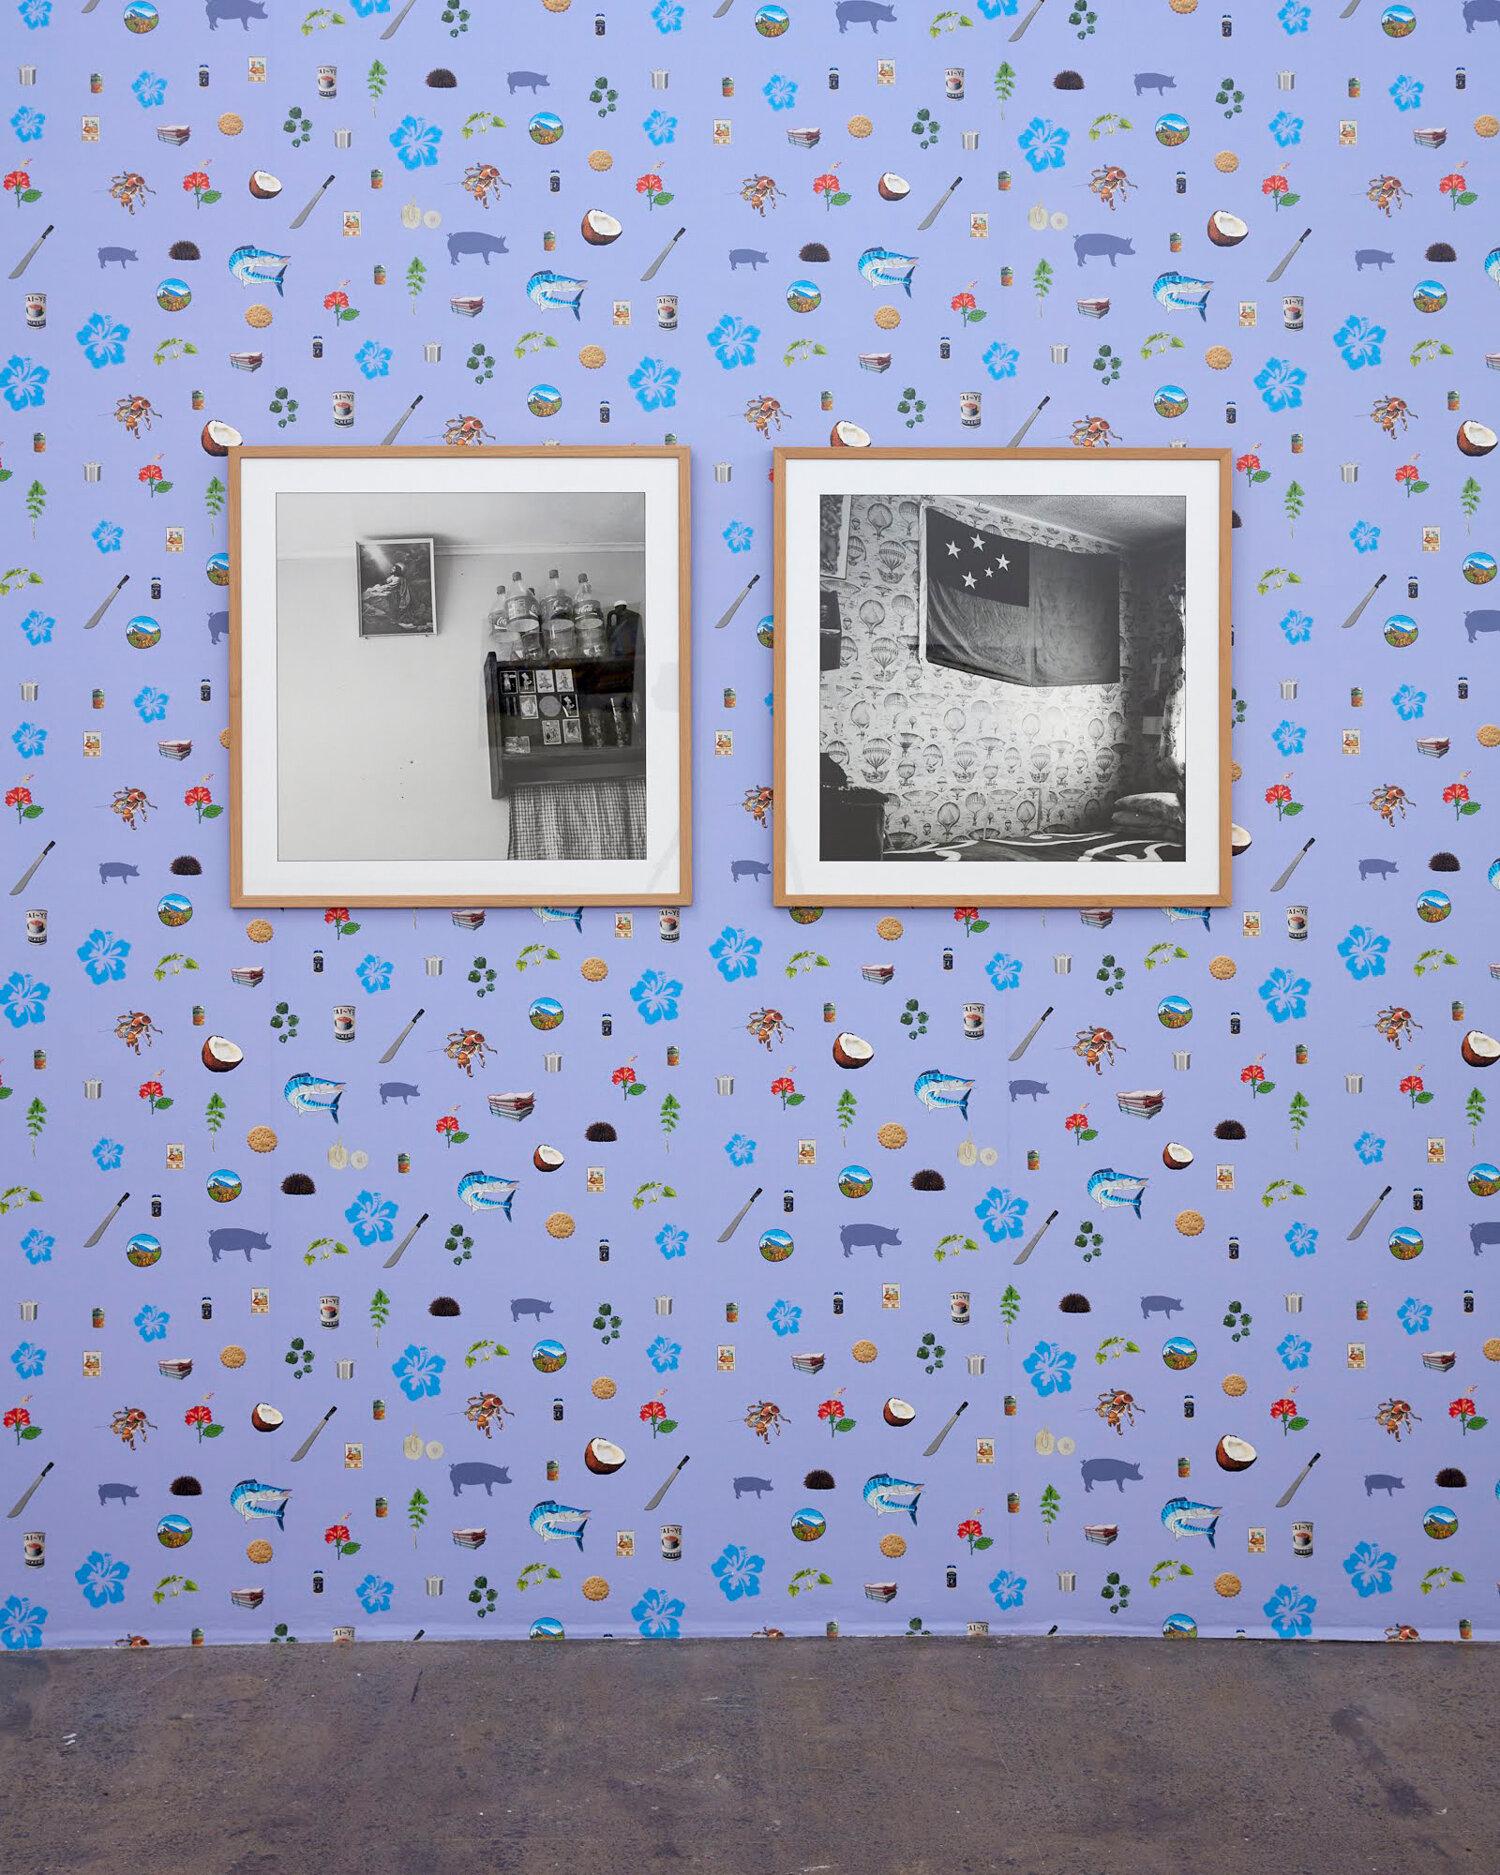 Louisa Afoa,  The Kitchen , digital photograph, 2011;  Ruebens Room , digital photograph, 2011; and  Untitled , ' Kai as Koha ', digitally printed wallpaper, 2019. Exhibited at Artspace. Photograph: Sam Hartnett. Courtesy of the artist.